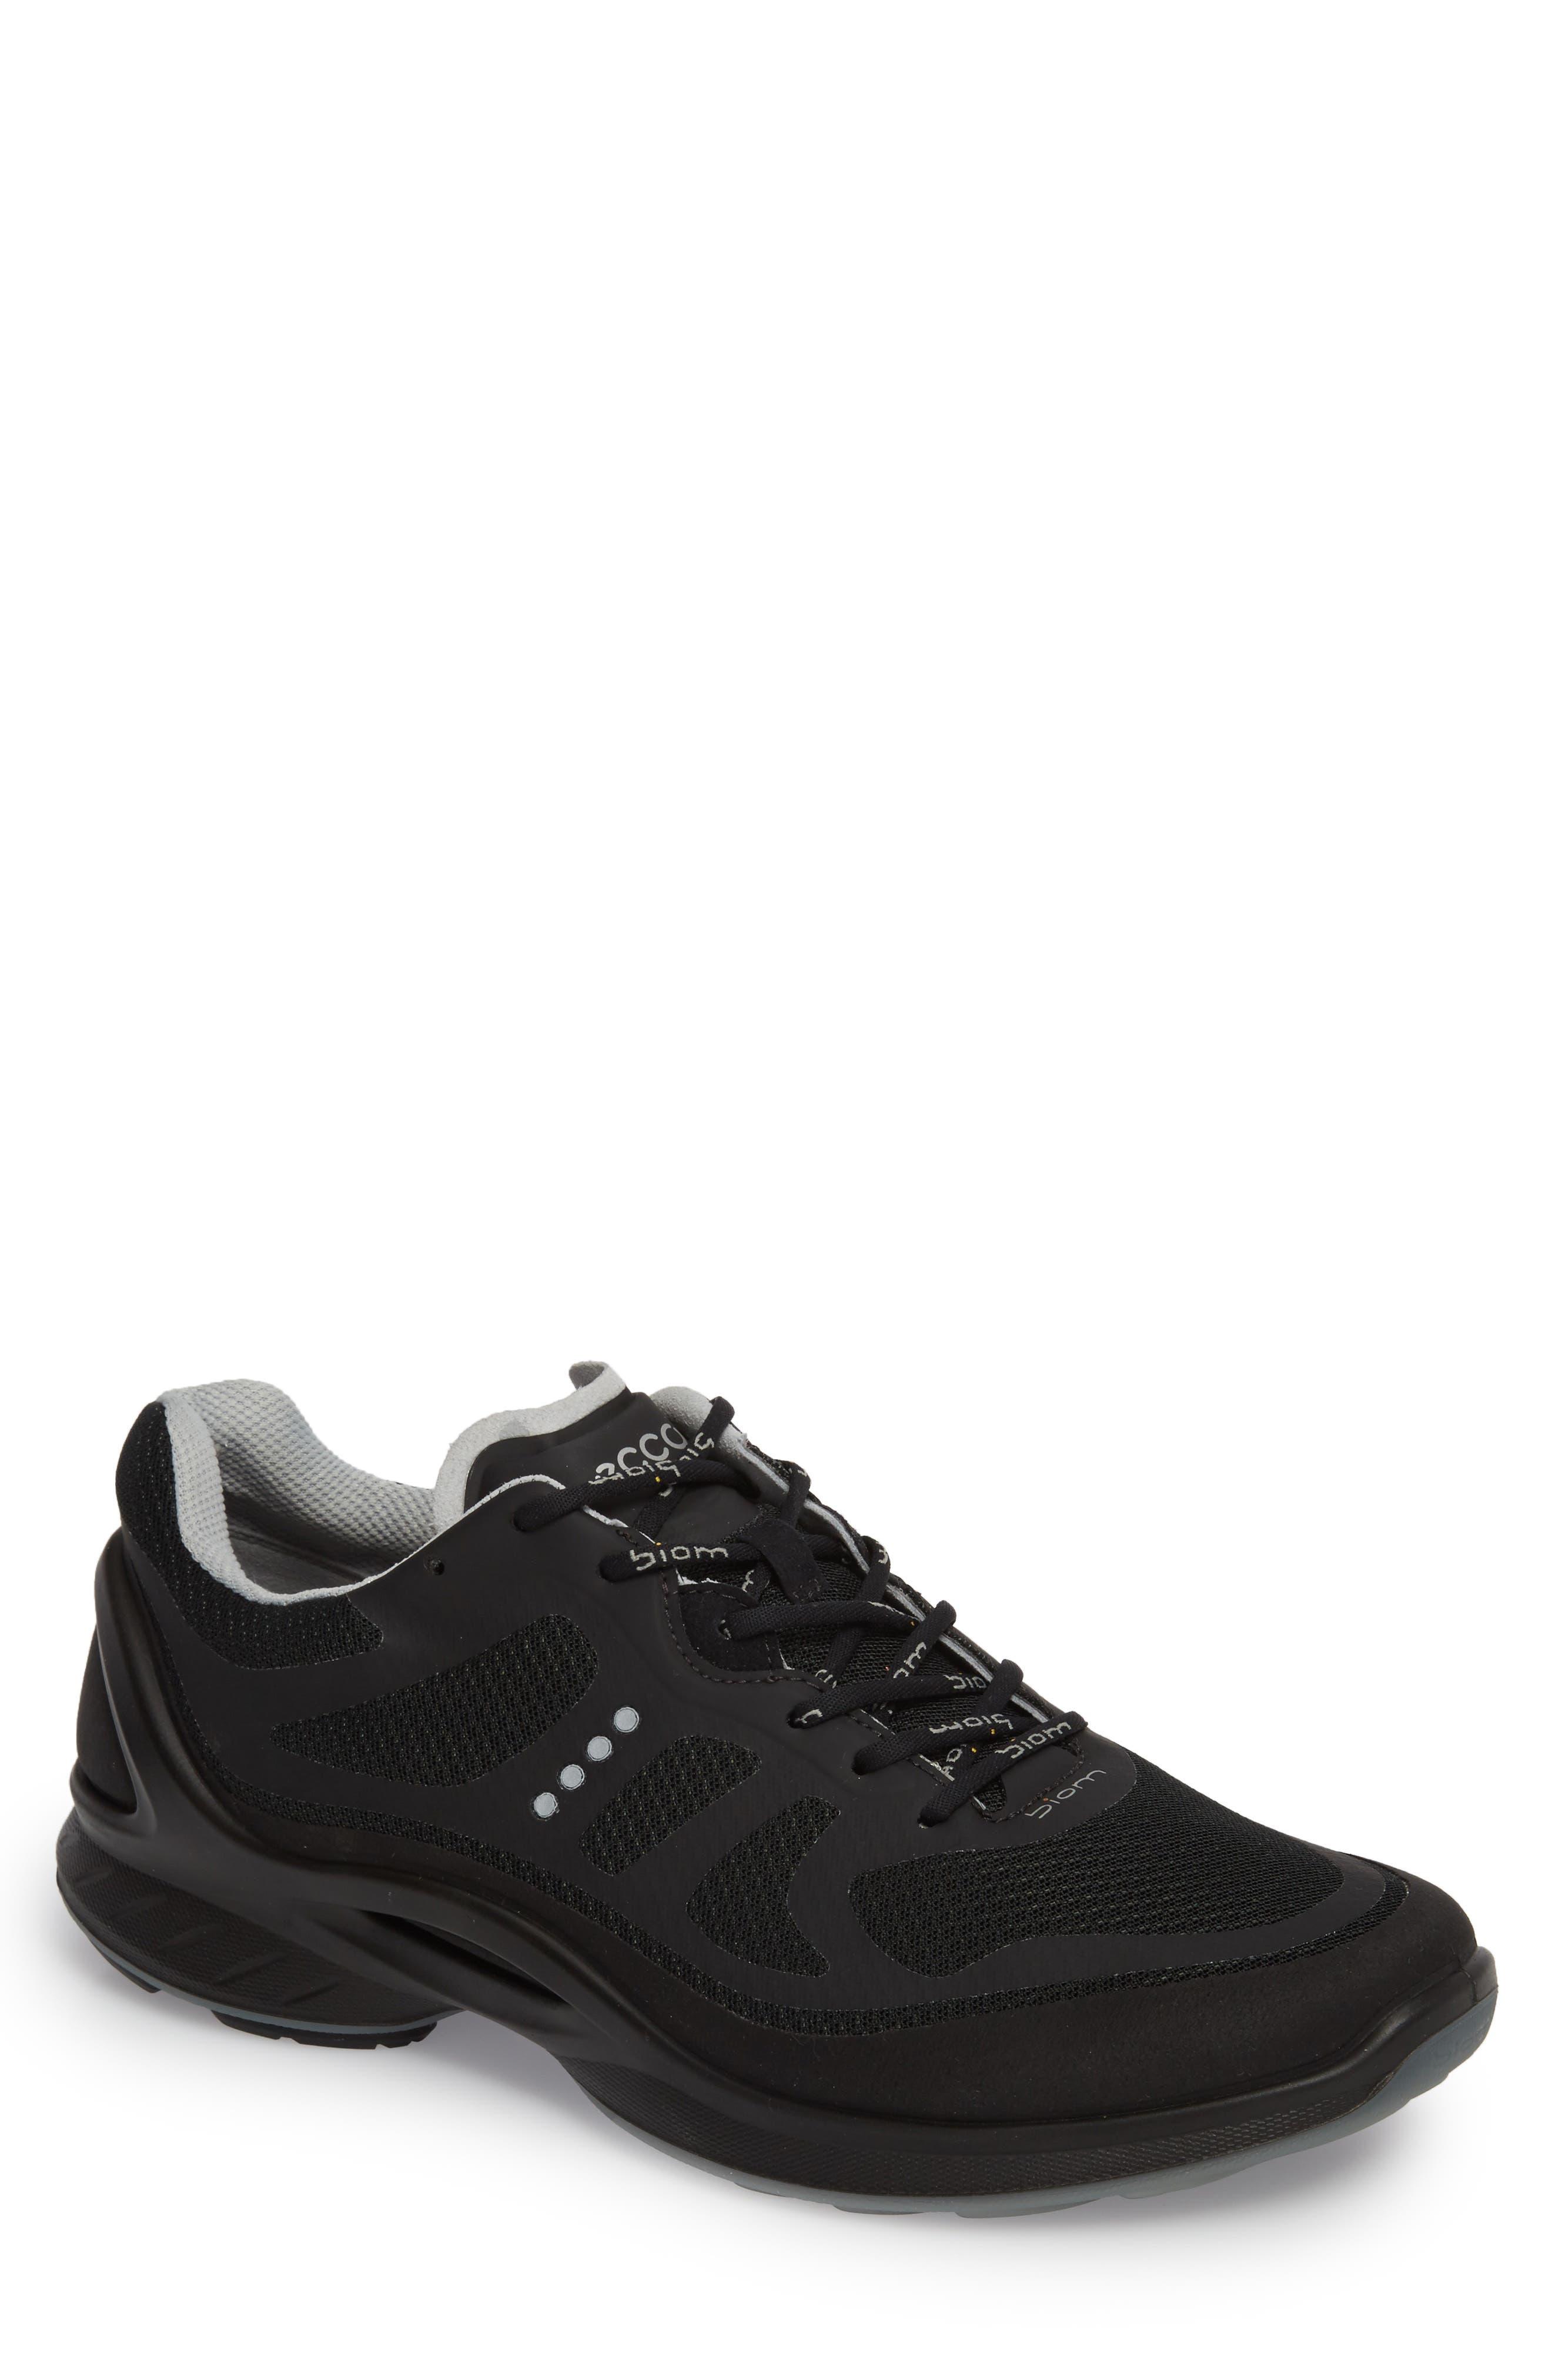 BIOM Fjuel Tie Sneaker,                             Main thumbnail 1, color,                             009